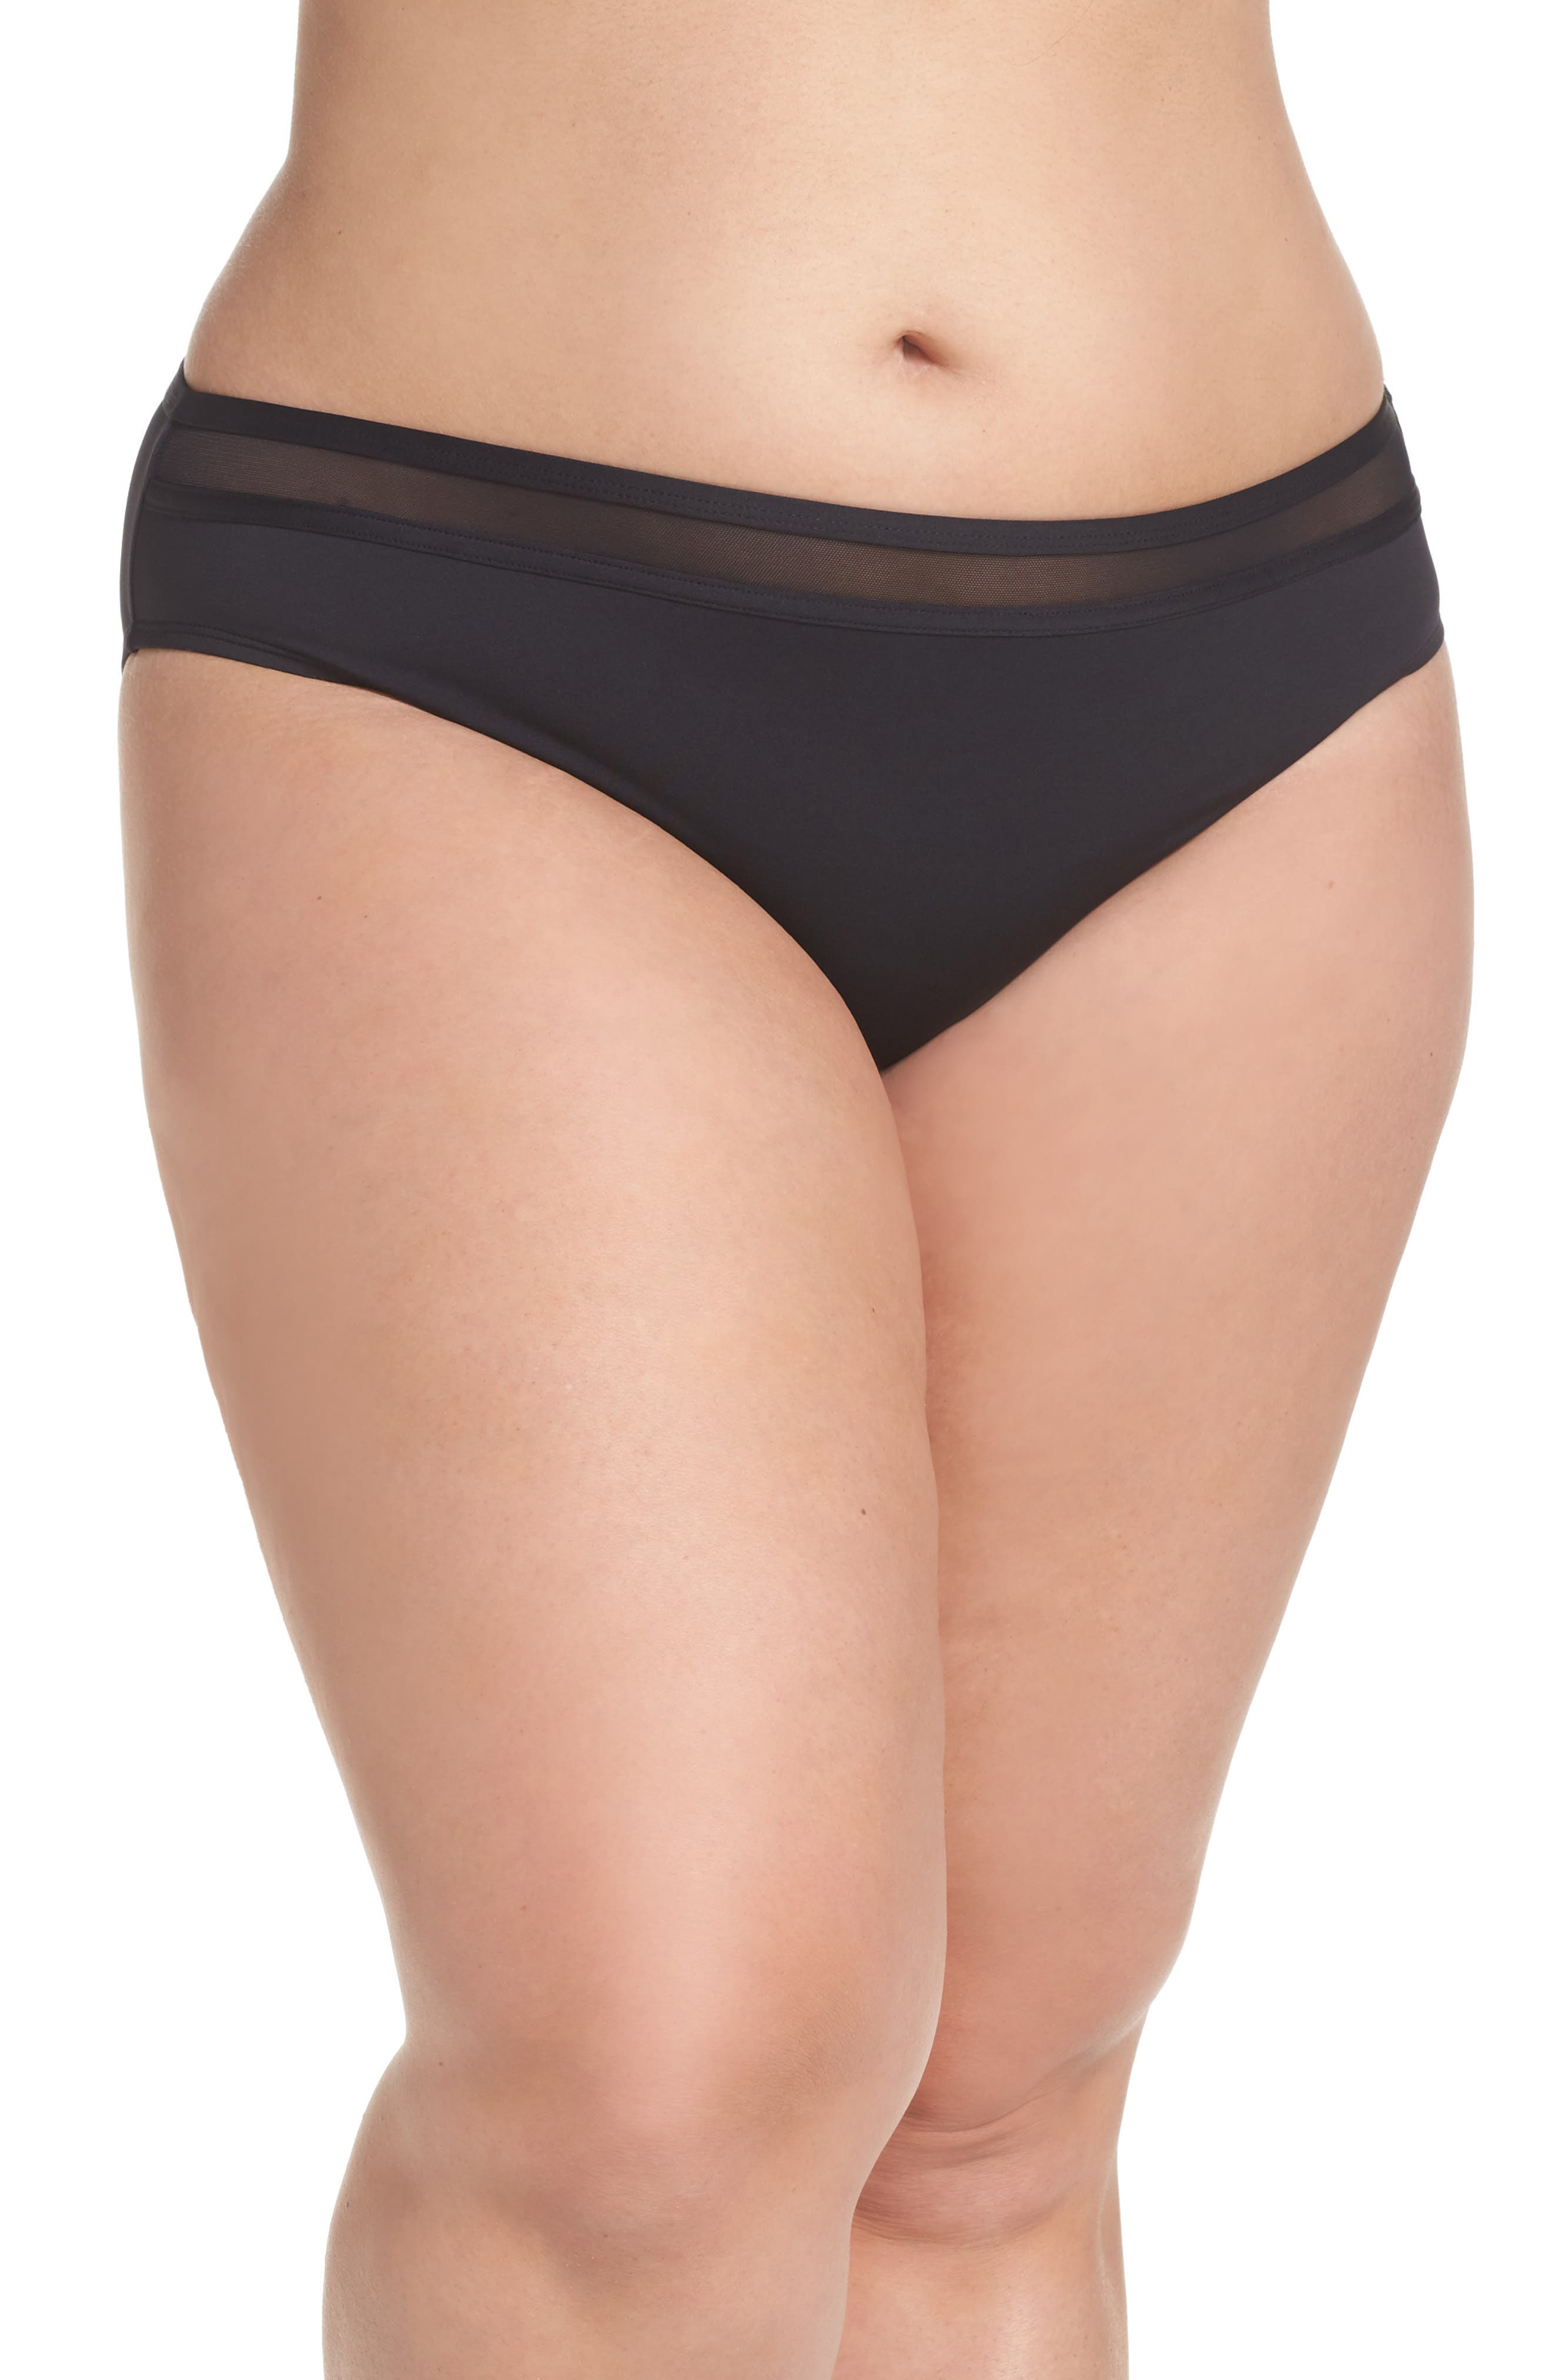 TOMMY BAHAMA Mesh Bikini Bottoms, Main, color, BLACK